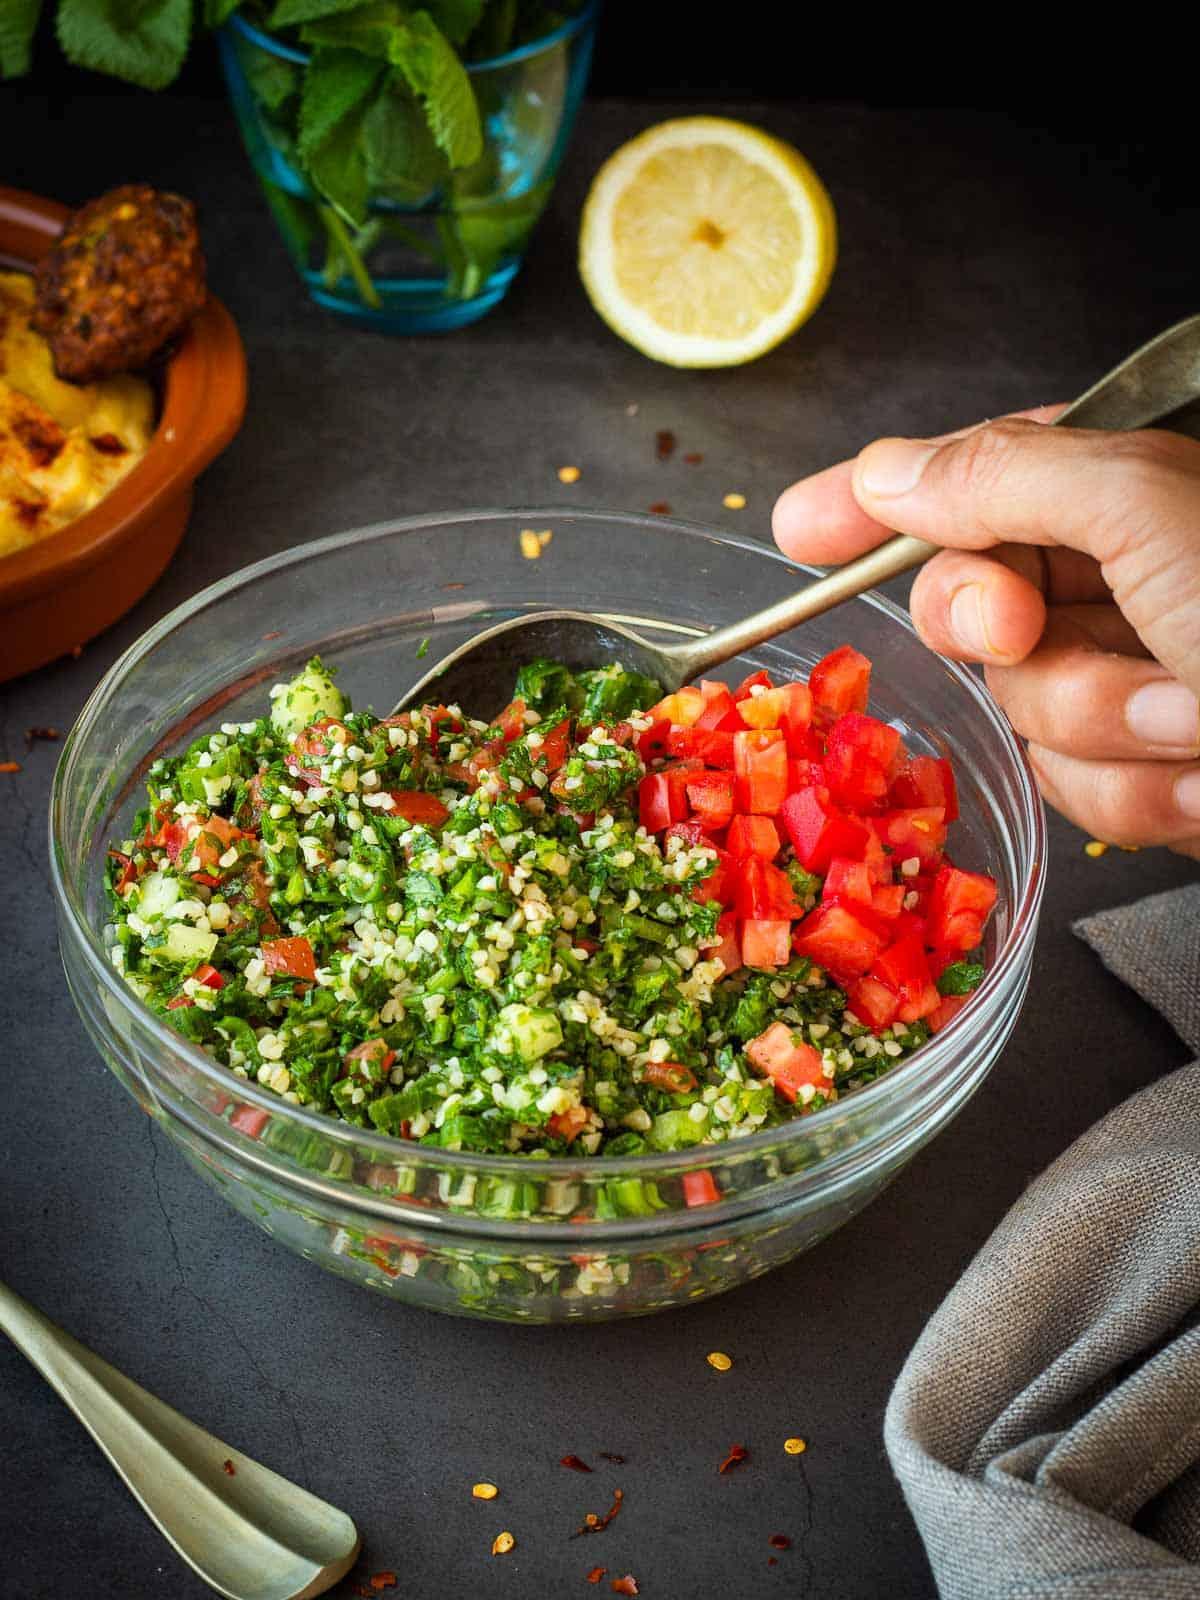 Tabbouleh Salad with Hummus and Falafel